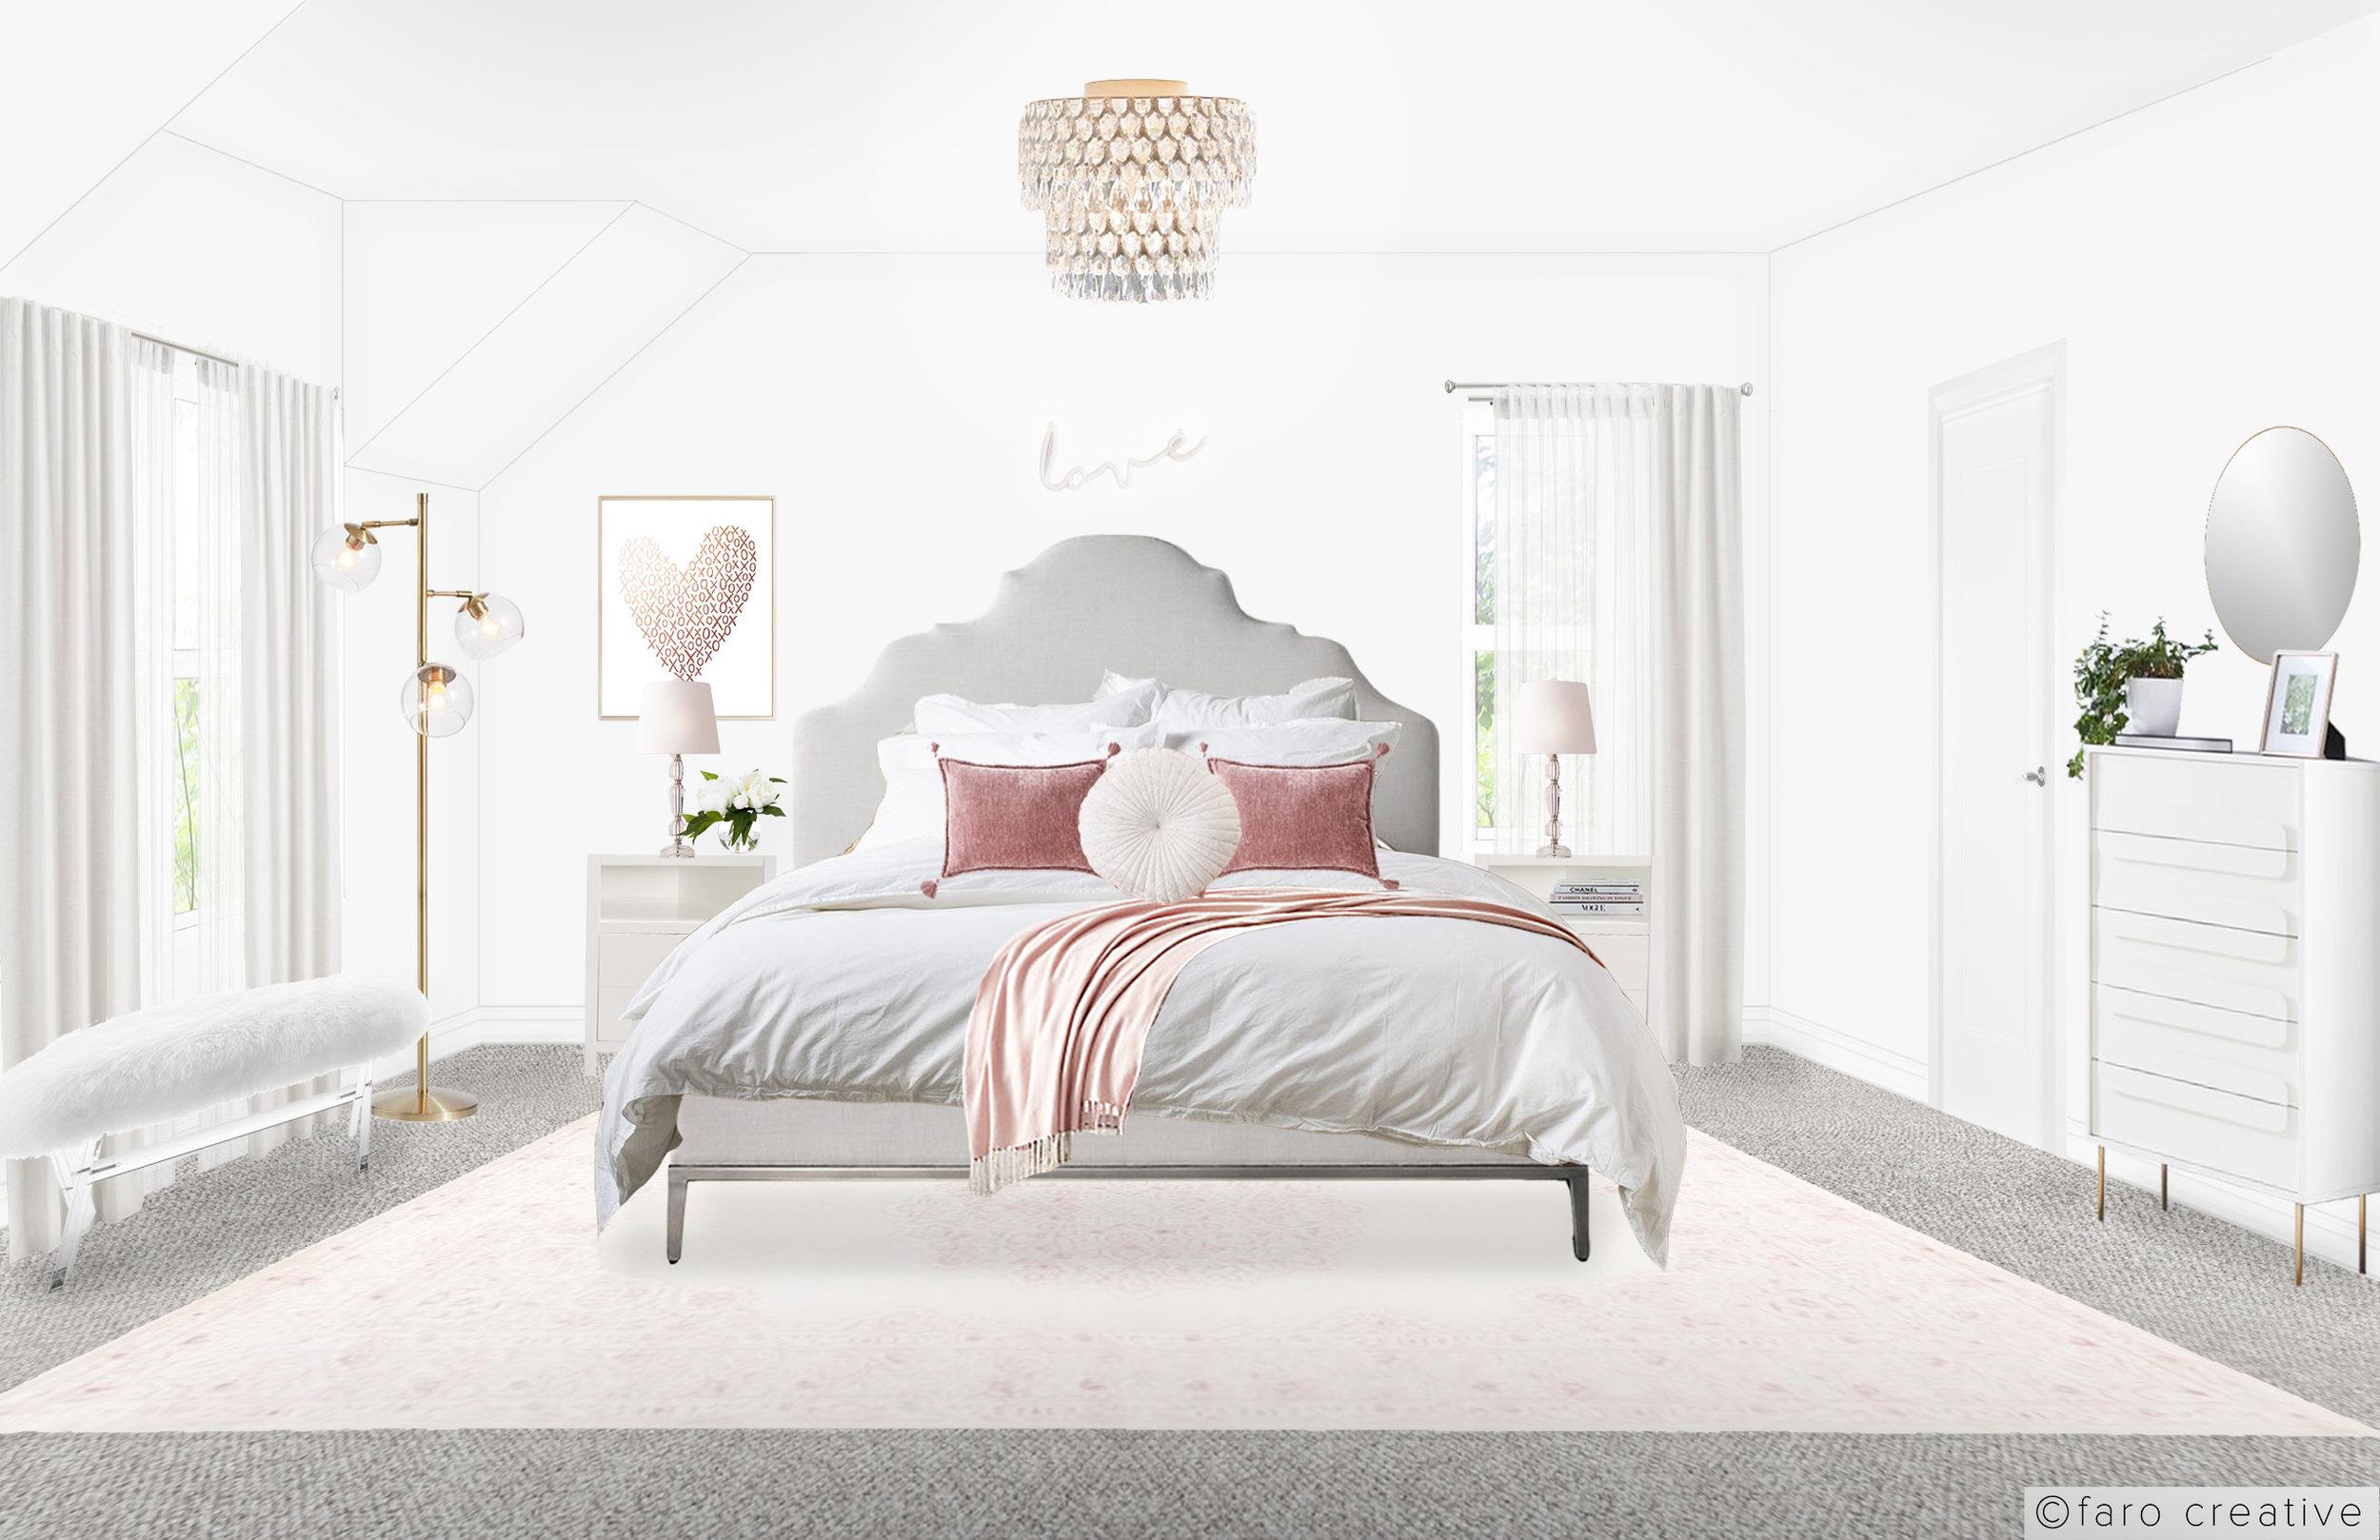 TW Bedroom Rendering 1.jpg